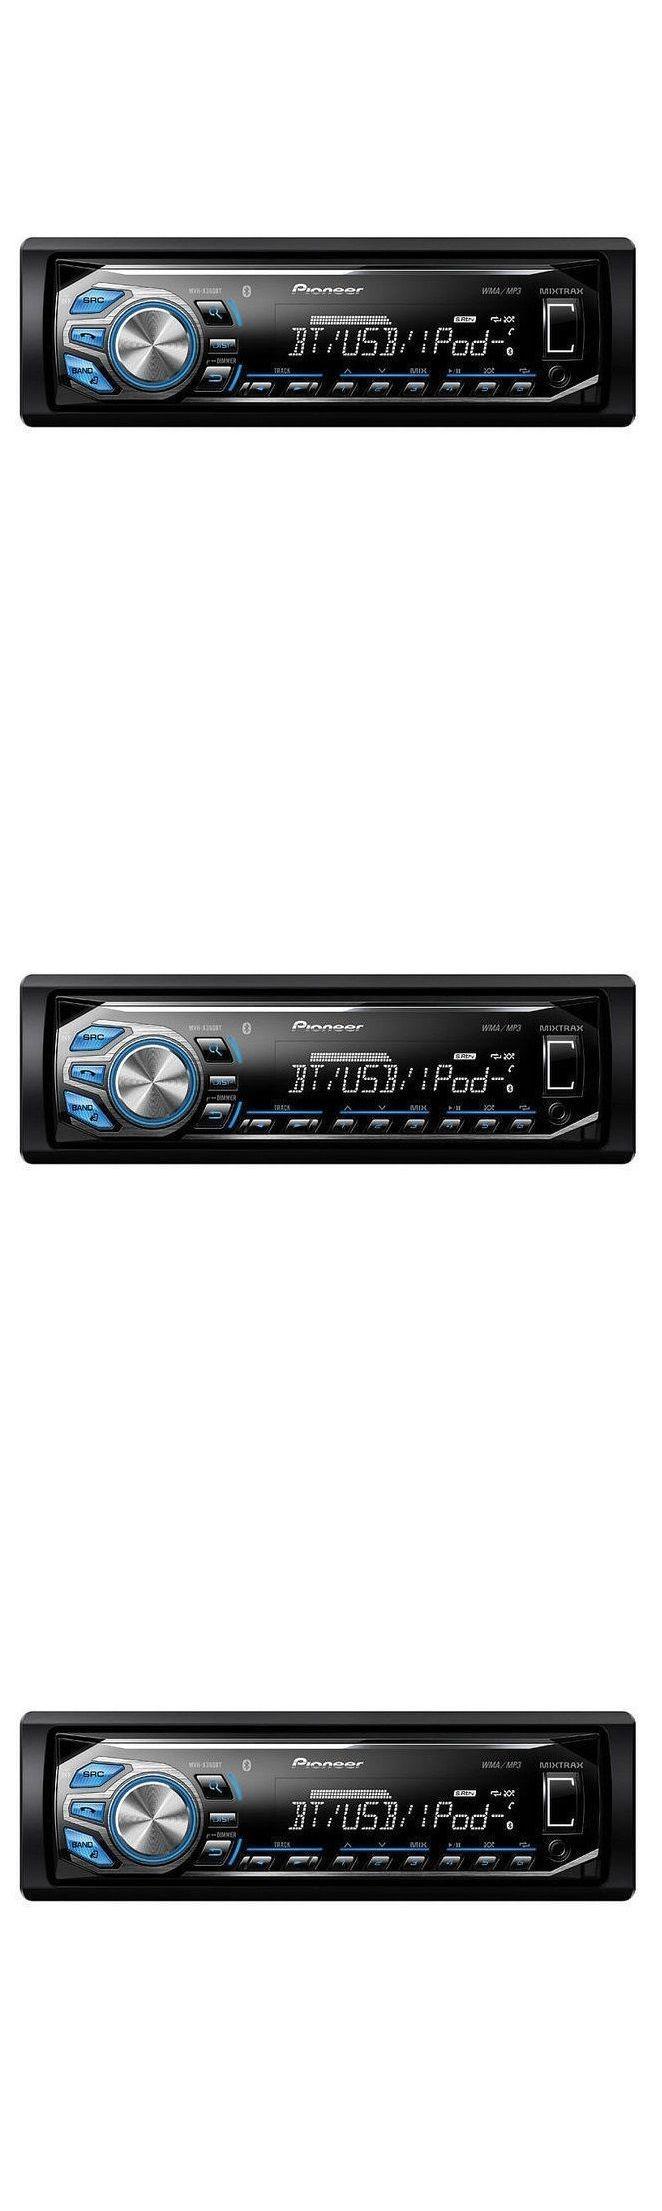 Car Audio In-Dash Units: Pioneer Car Stereo Head Unit Aux Usb Mp3 Bluetooth Radio Digital Media Player -> BUY IT NOW ONLY: $69.95 on eBay!